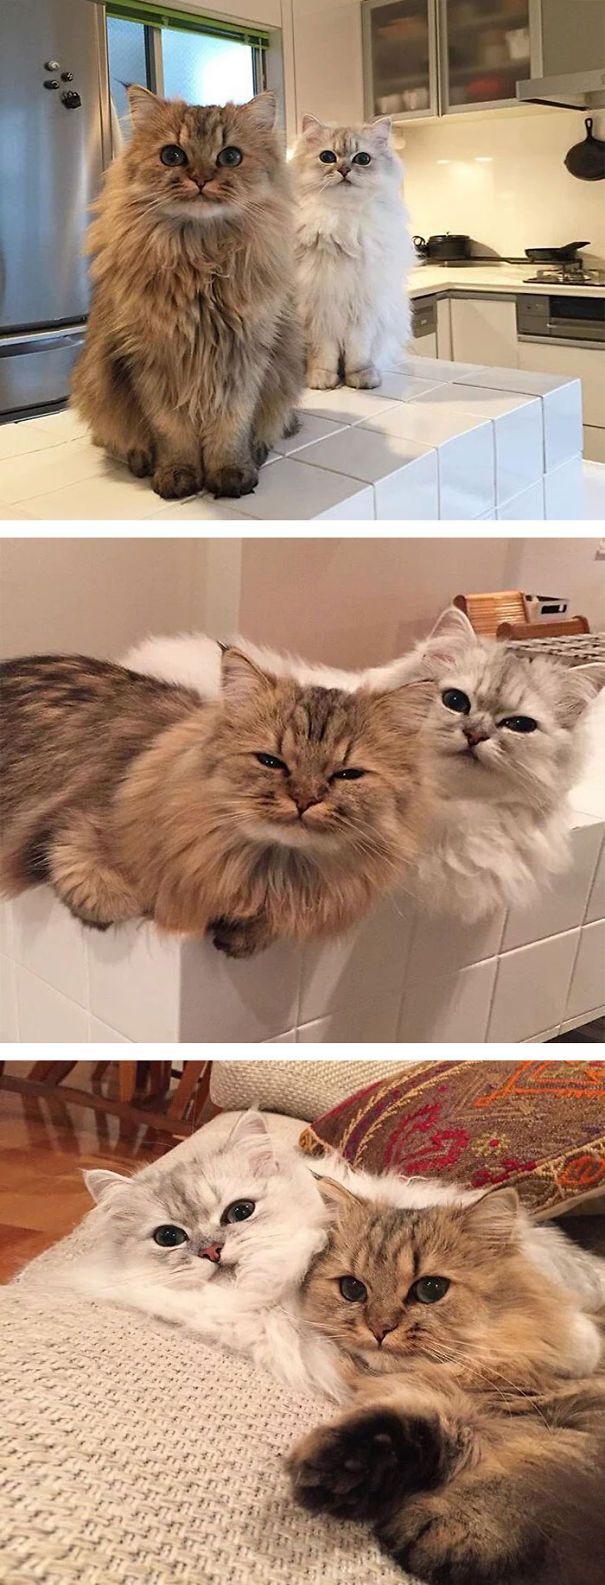 Funny Cat Pics With Quotes Bilder - Funny Cat Pics With Quotes Bilder